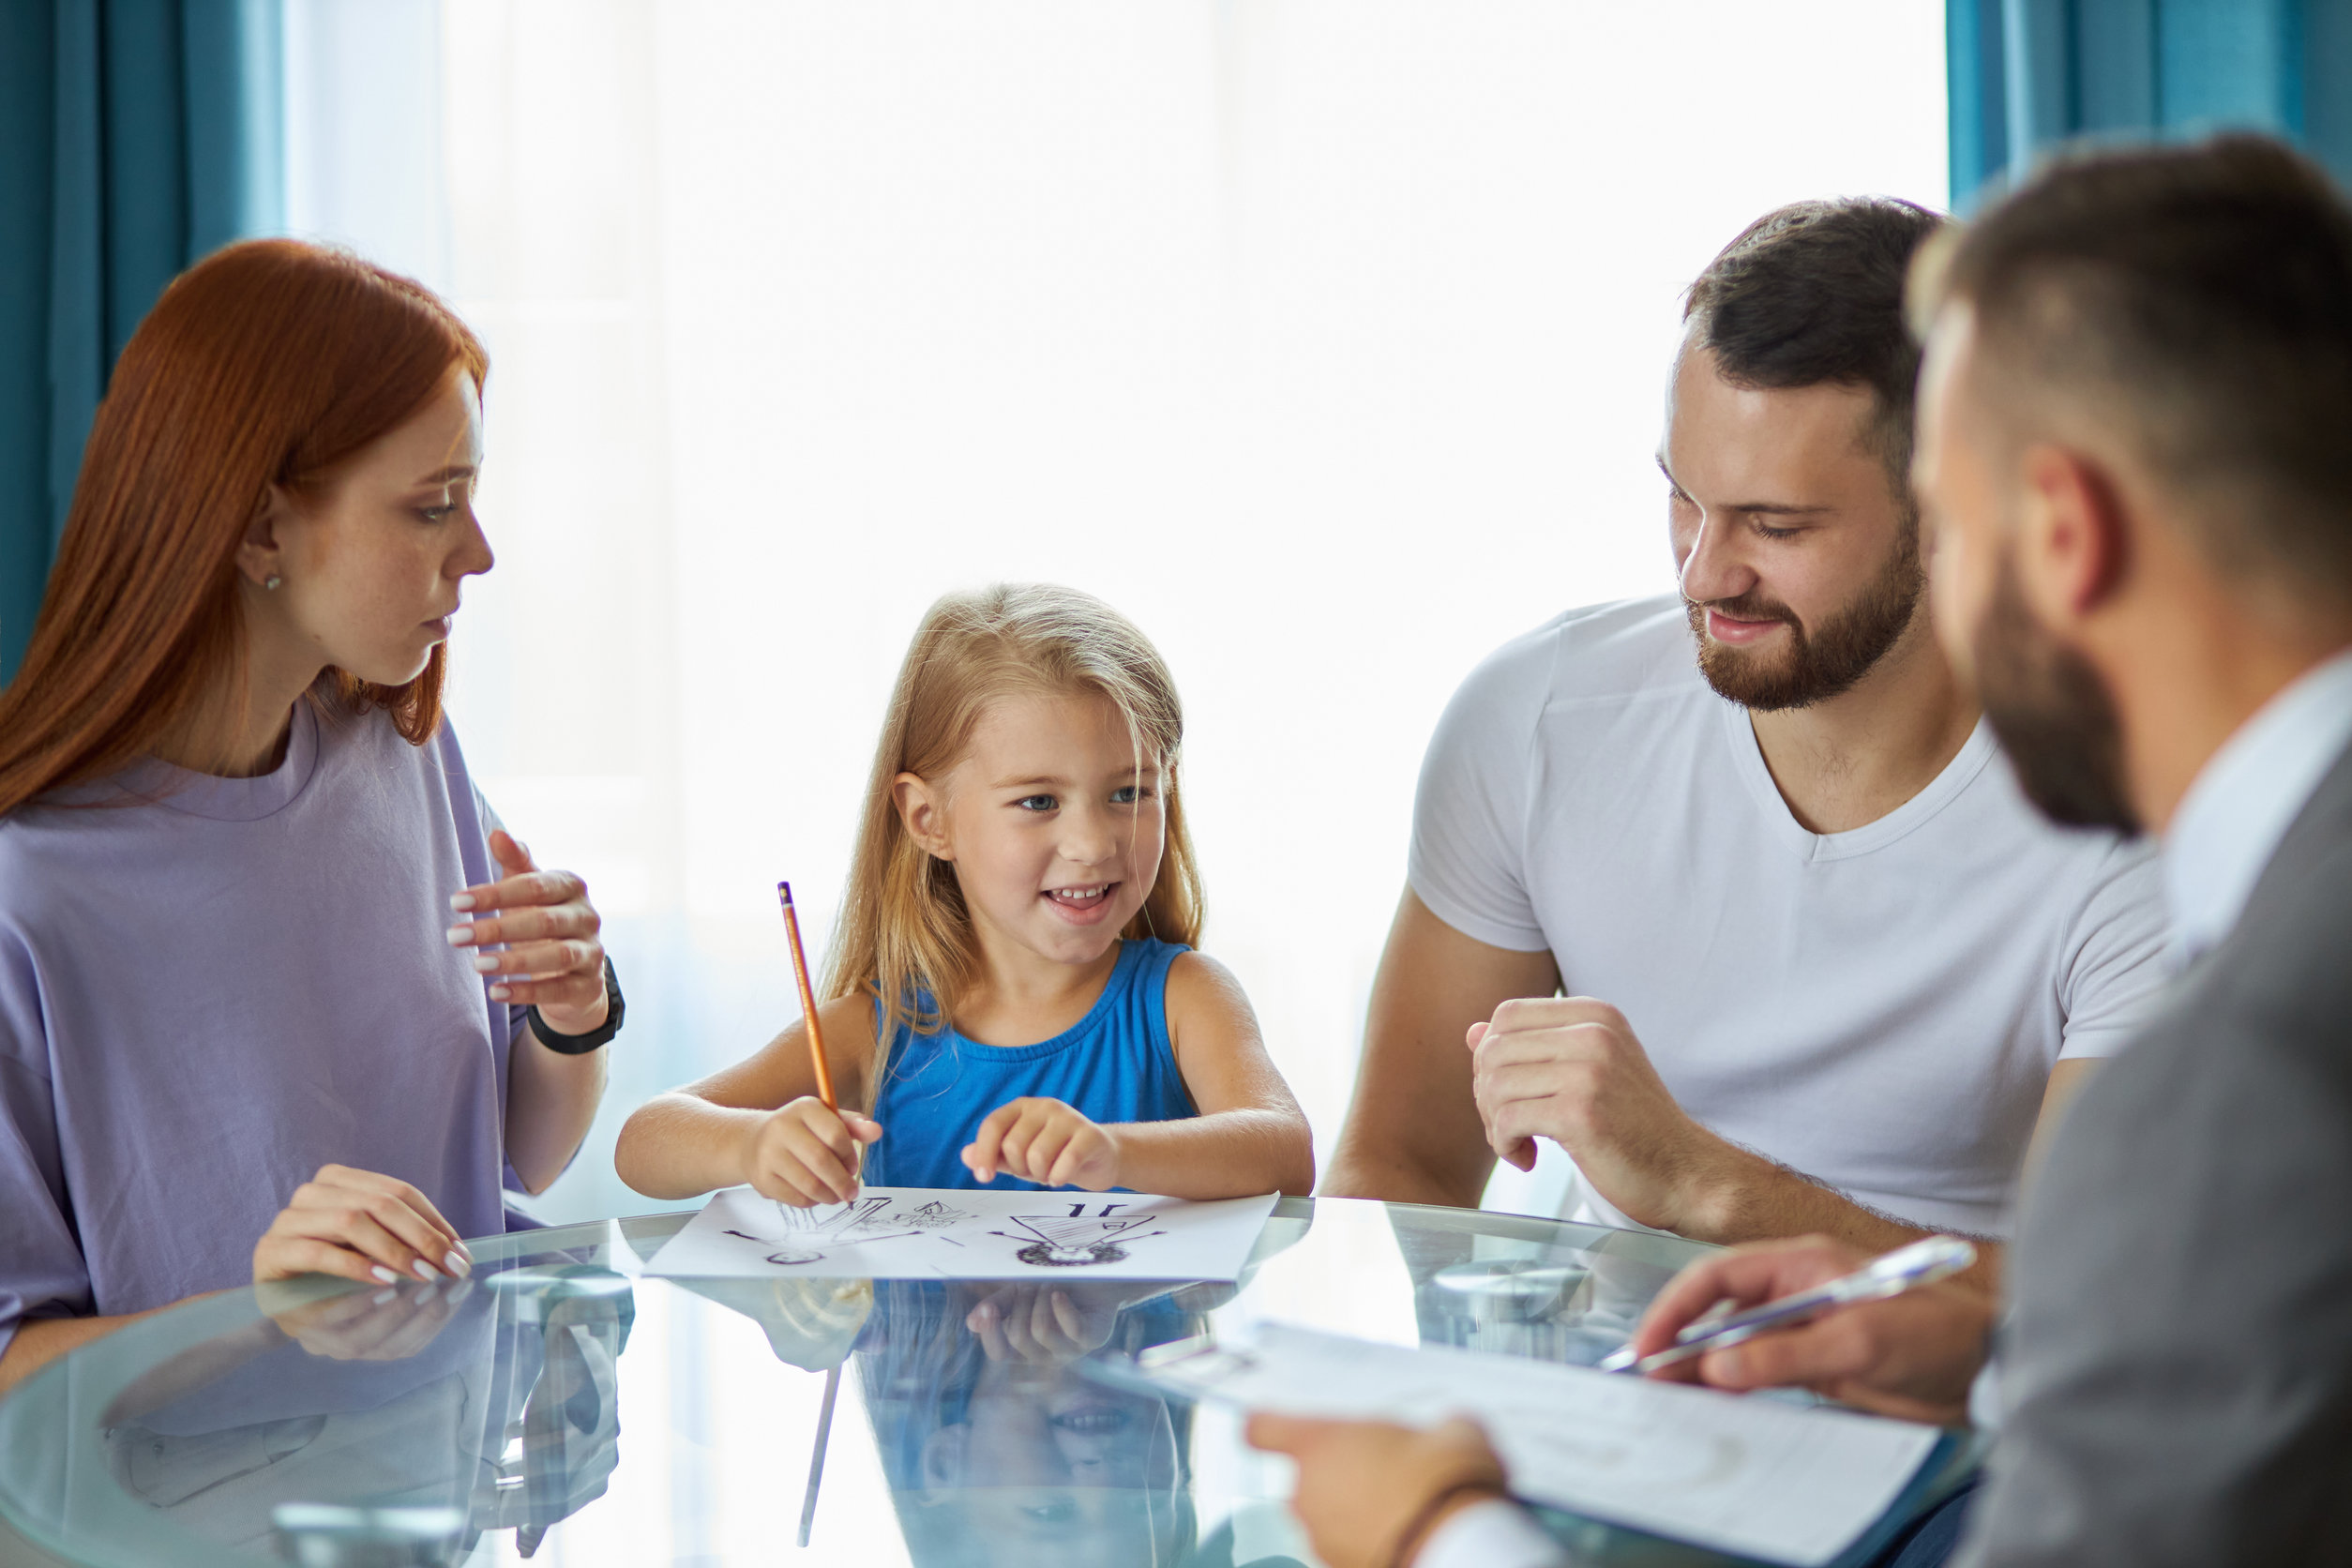 Child and adolescent behavioral health services